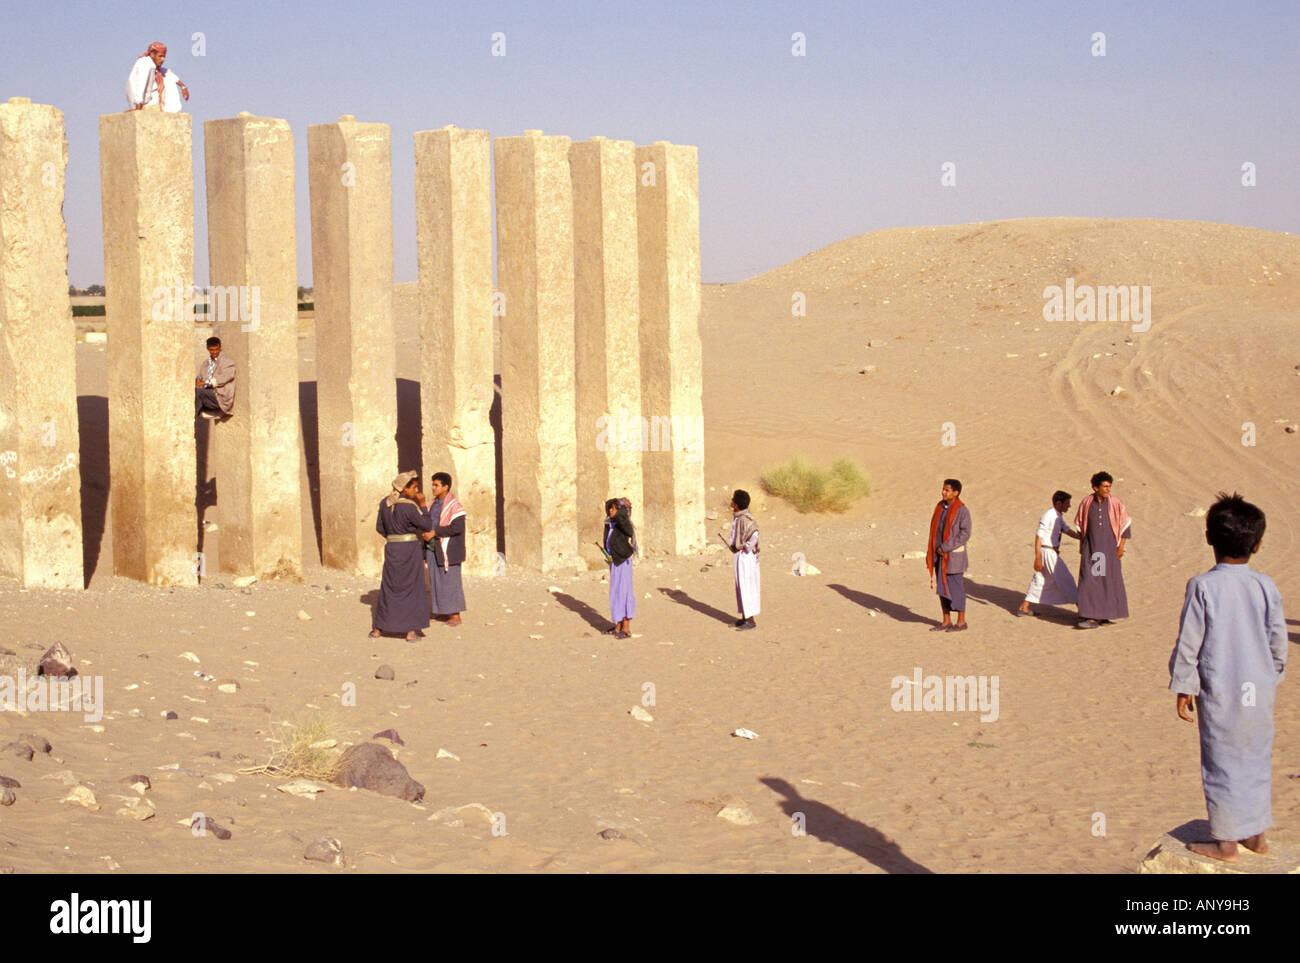 Asia, Middle East, Republic of Yemen, Ma'Rib. Awwam Temple - Stock Image